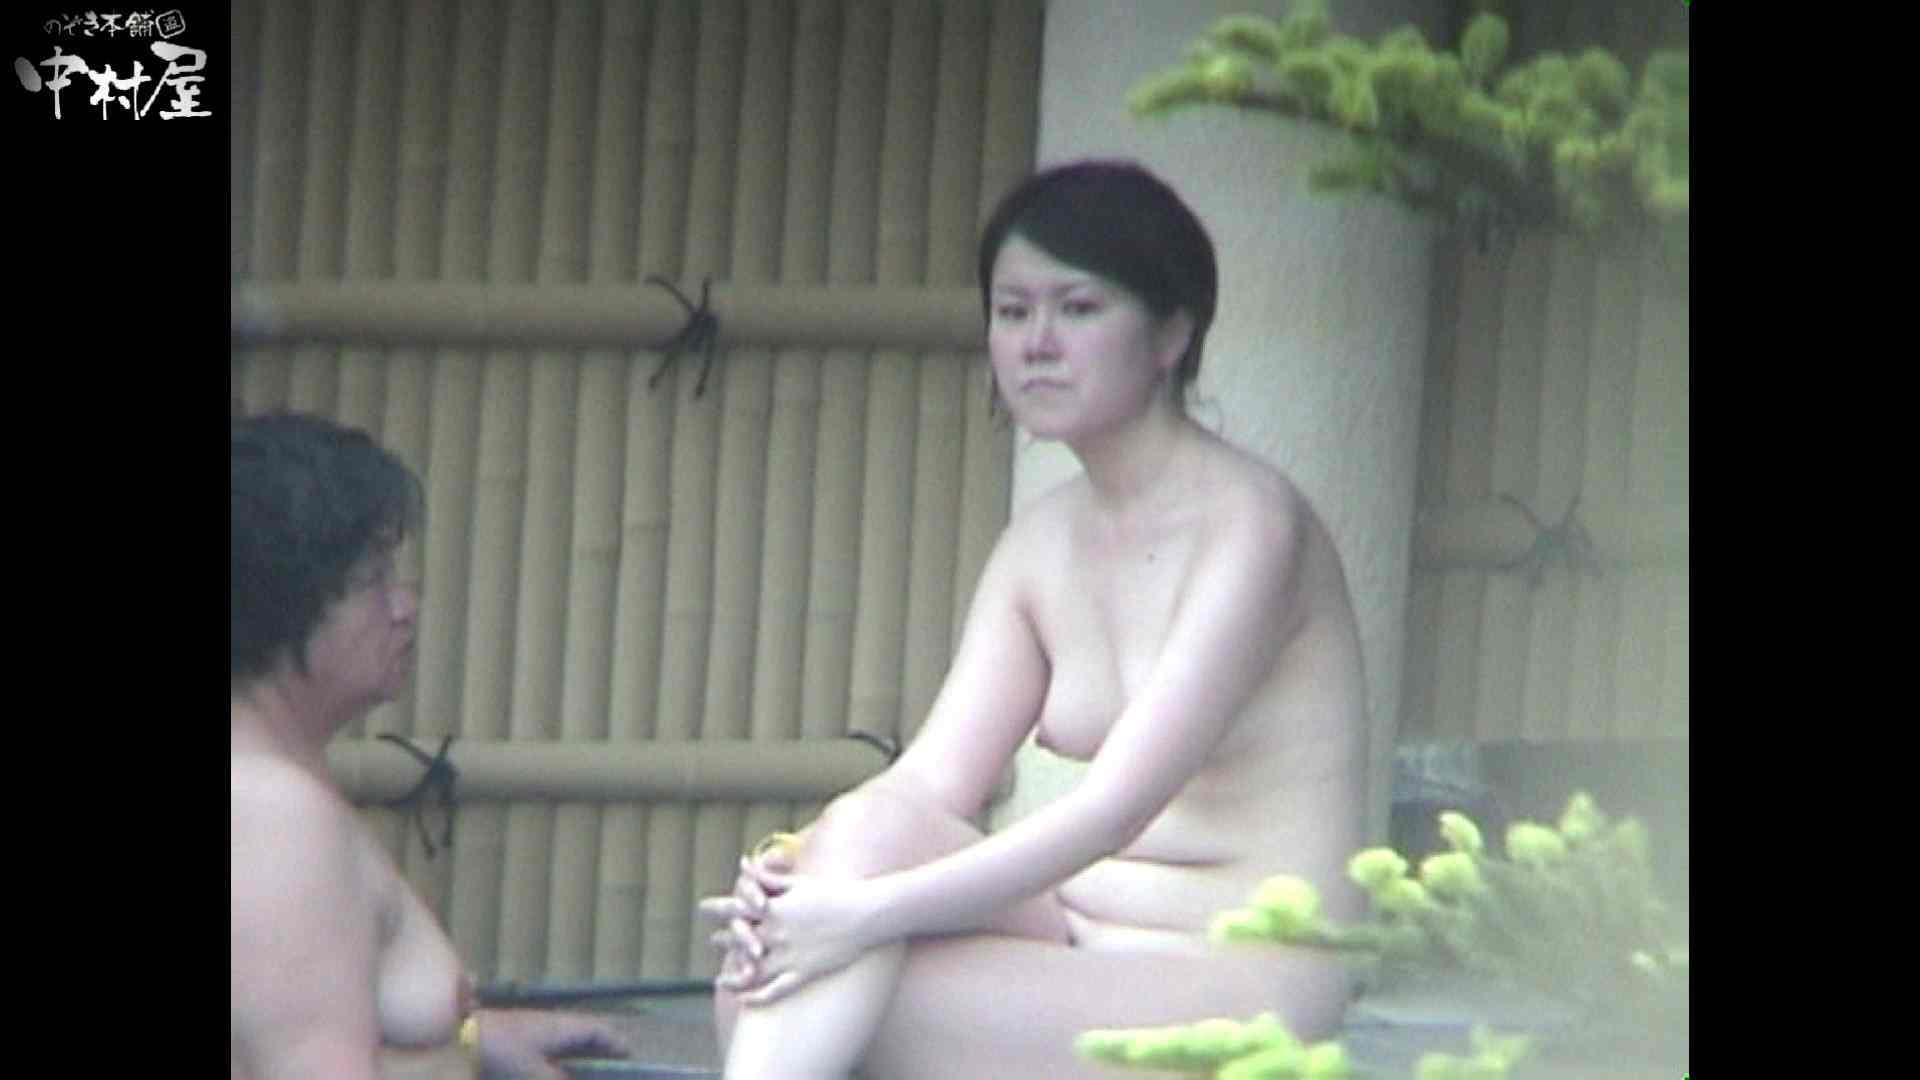 Aquaな露天風呂Vol.935 露天 | HなOL  86pic 21